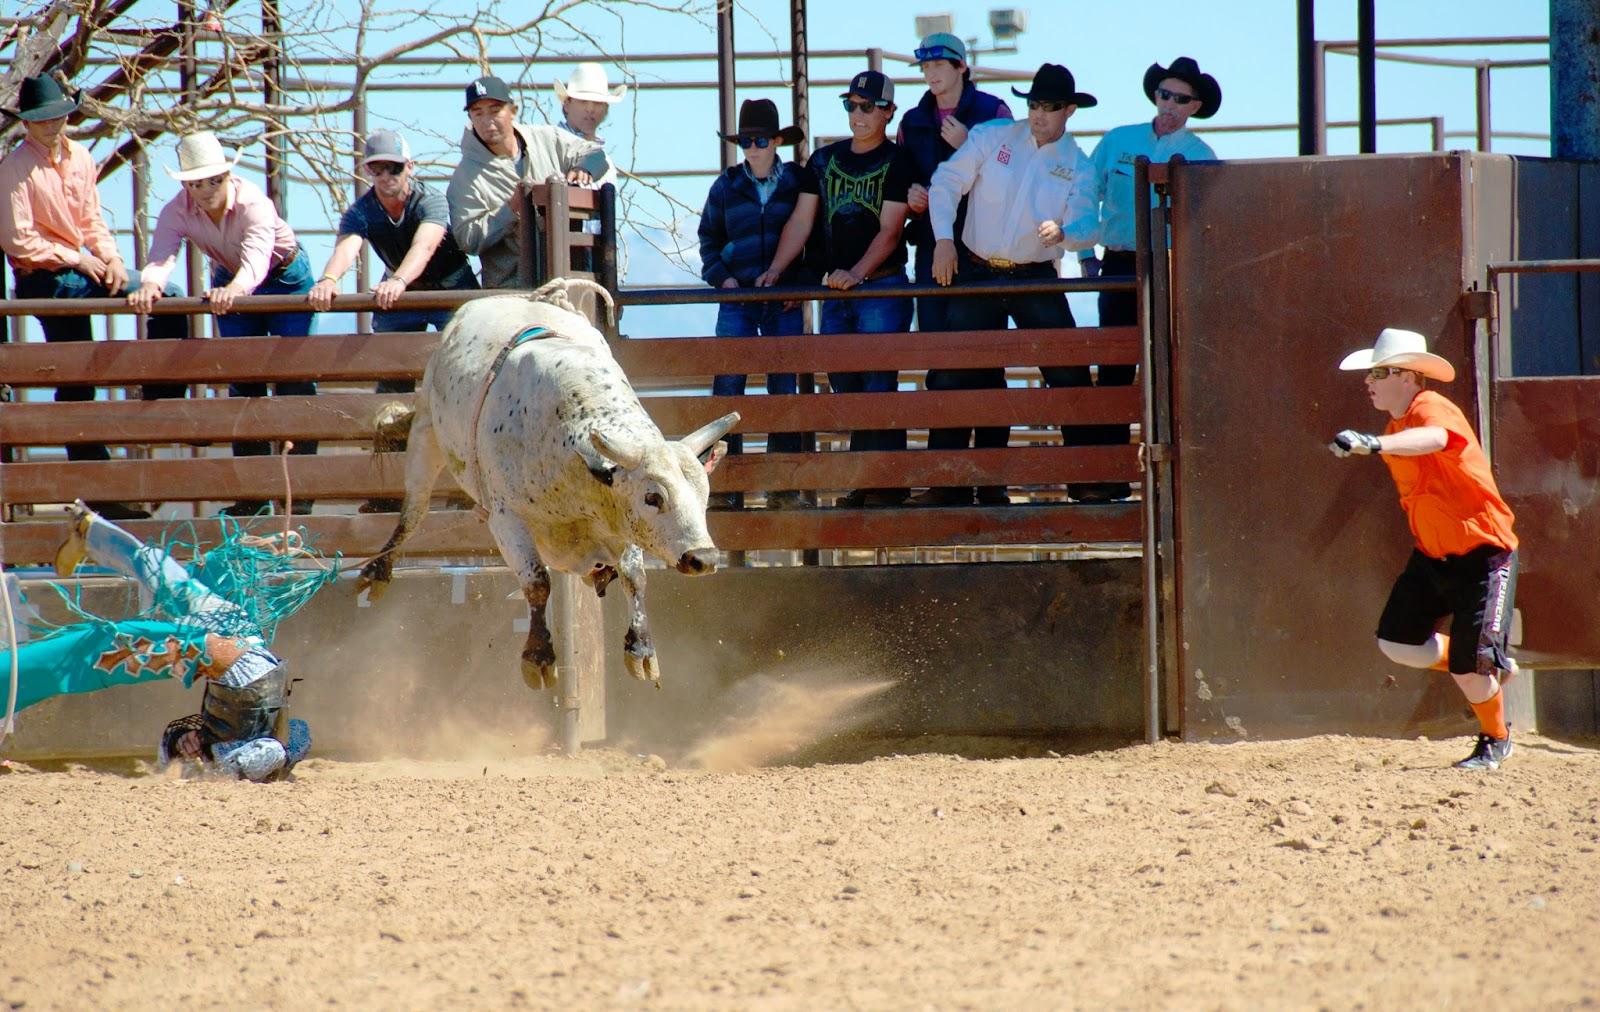 Heidi Utz Photography, rodeo photos